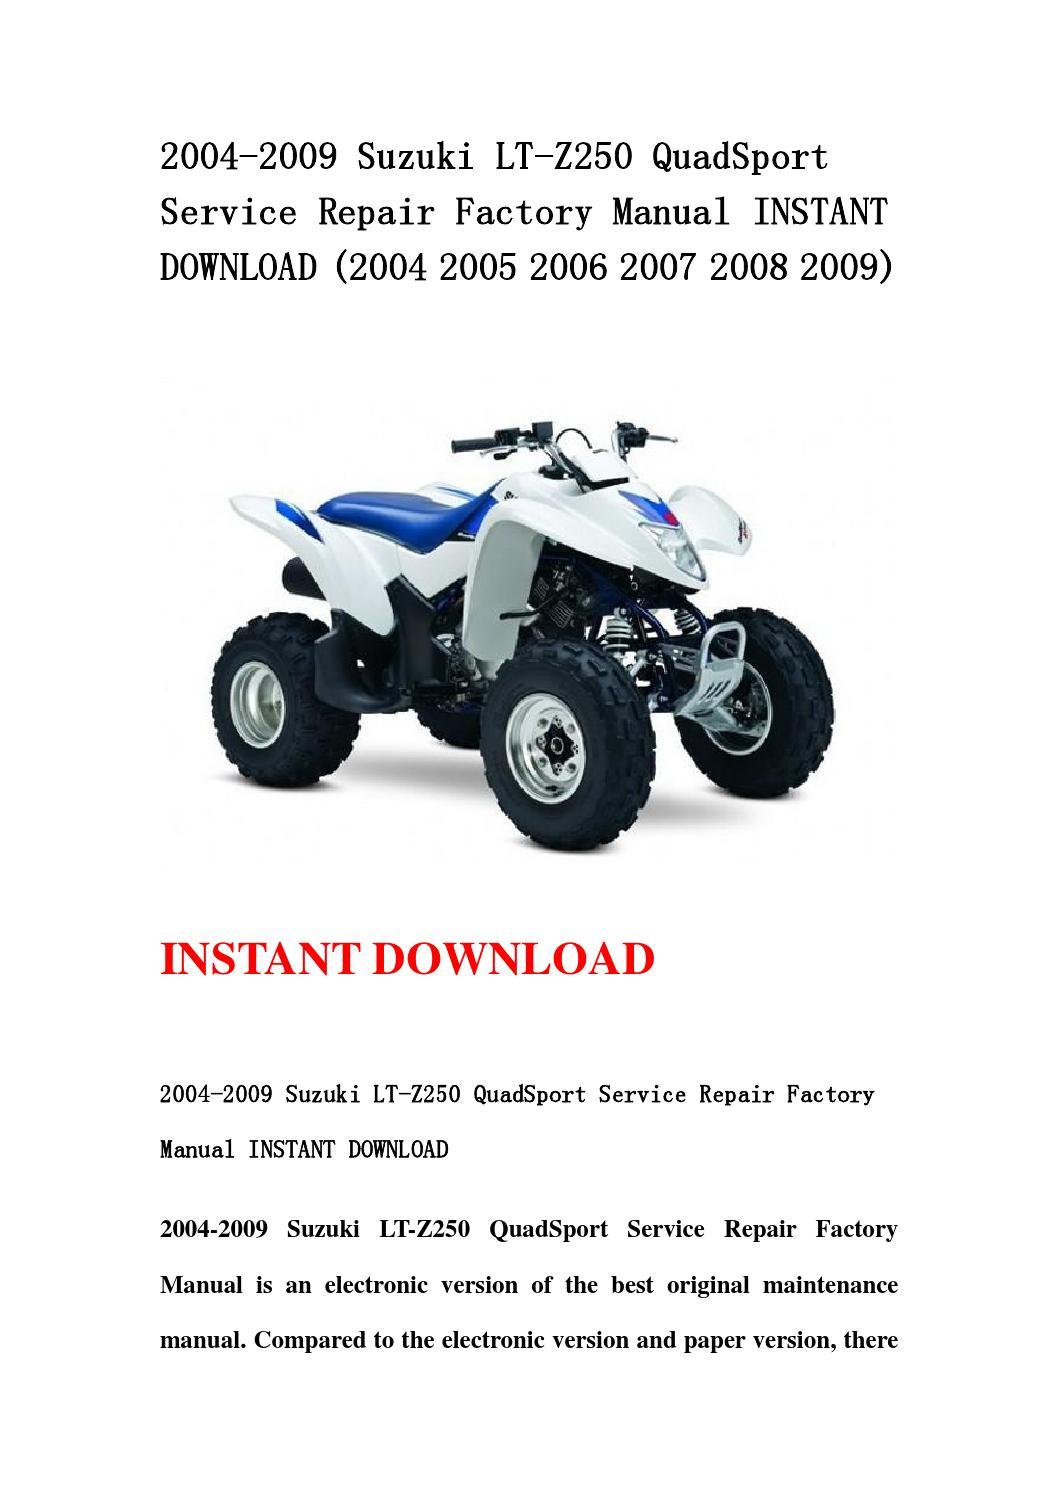 2004 2009 suzuki lt z250 quadsport service repair factory manual instant  download (2004 2005 2006 20 by dhsefgbsef67 - issuu